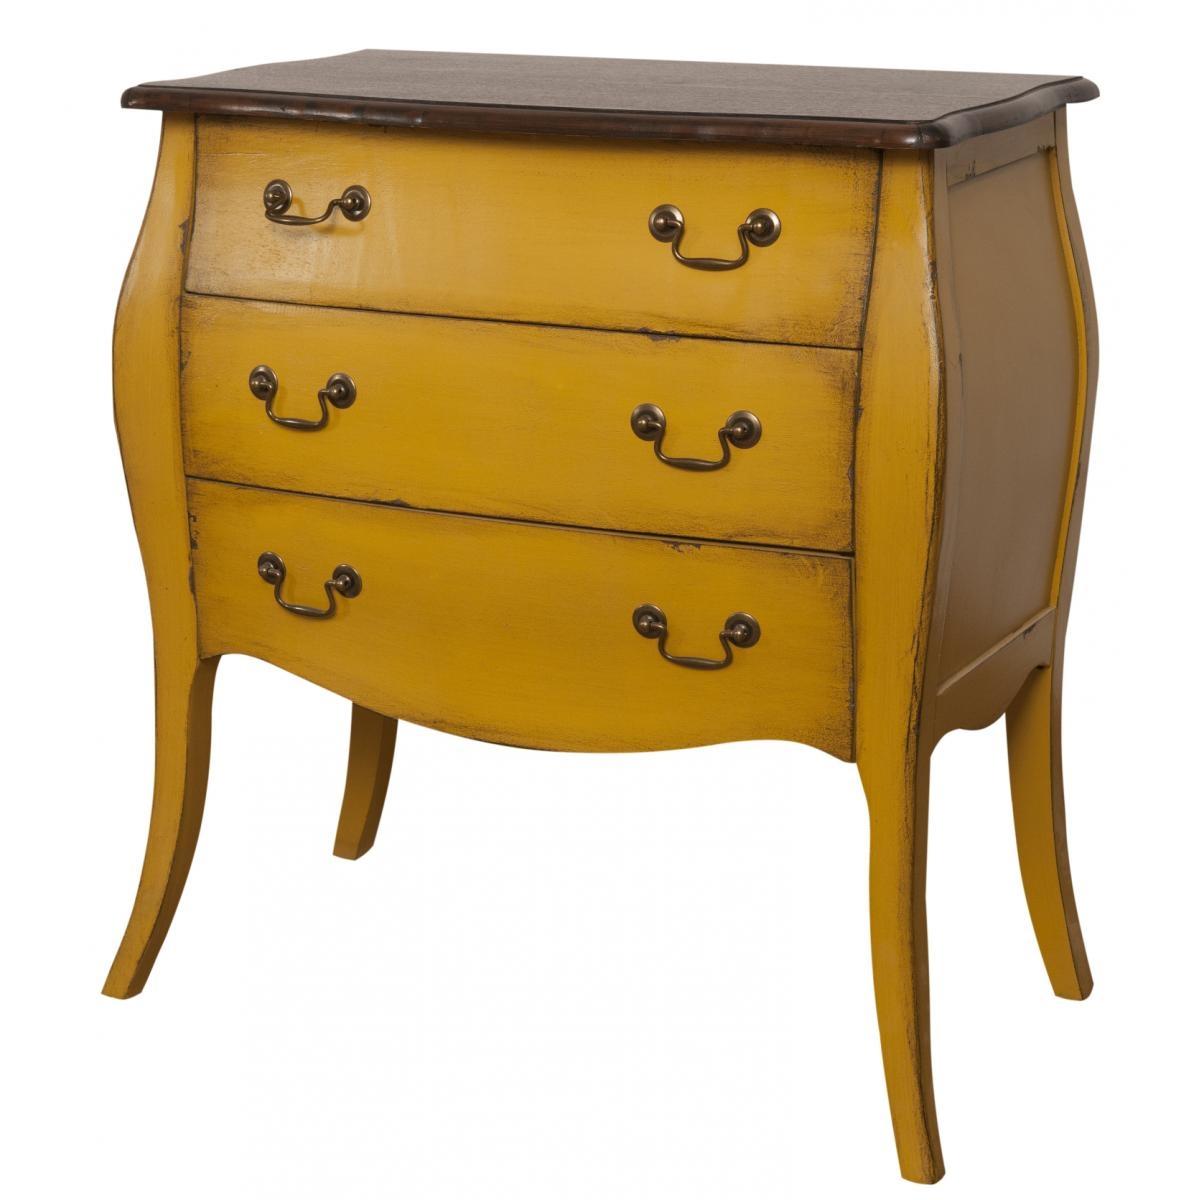 Cabinet din lemn de plop, furnir si MDF, cu 3 sertare Mellow Medium Yellow / Brown, l69xA39xH77 cm imagine